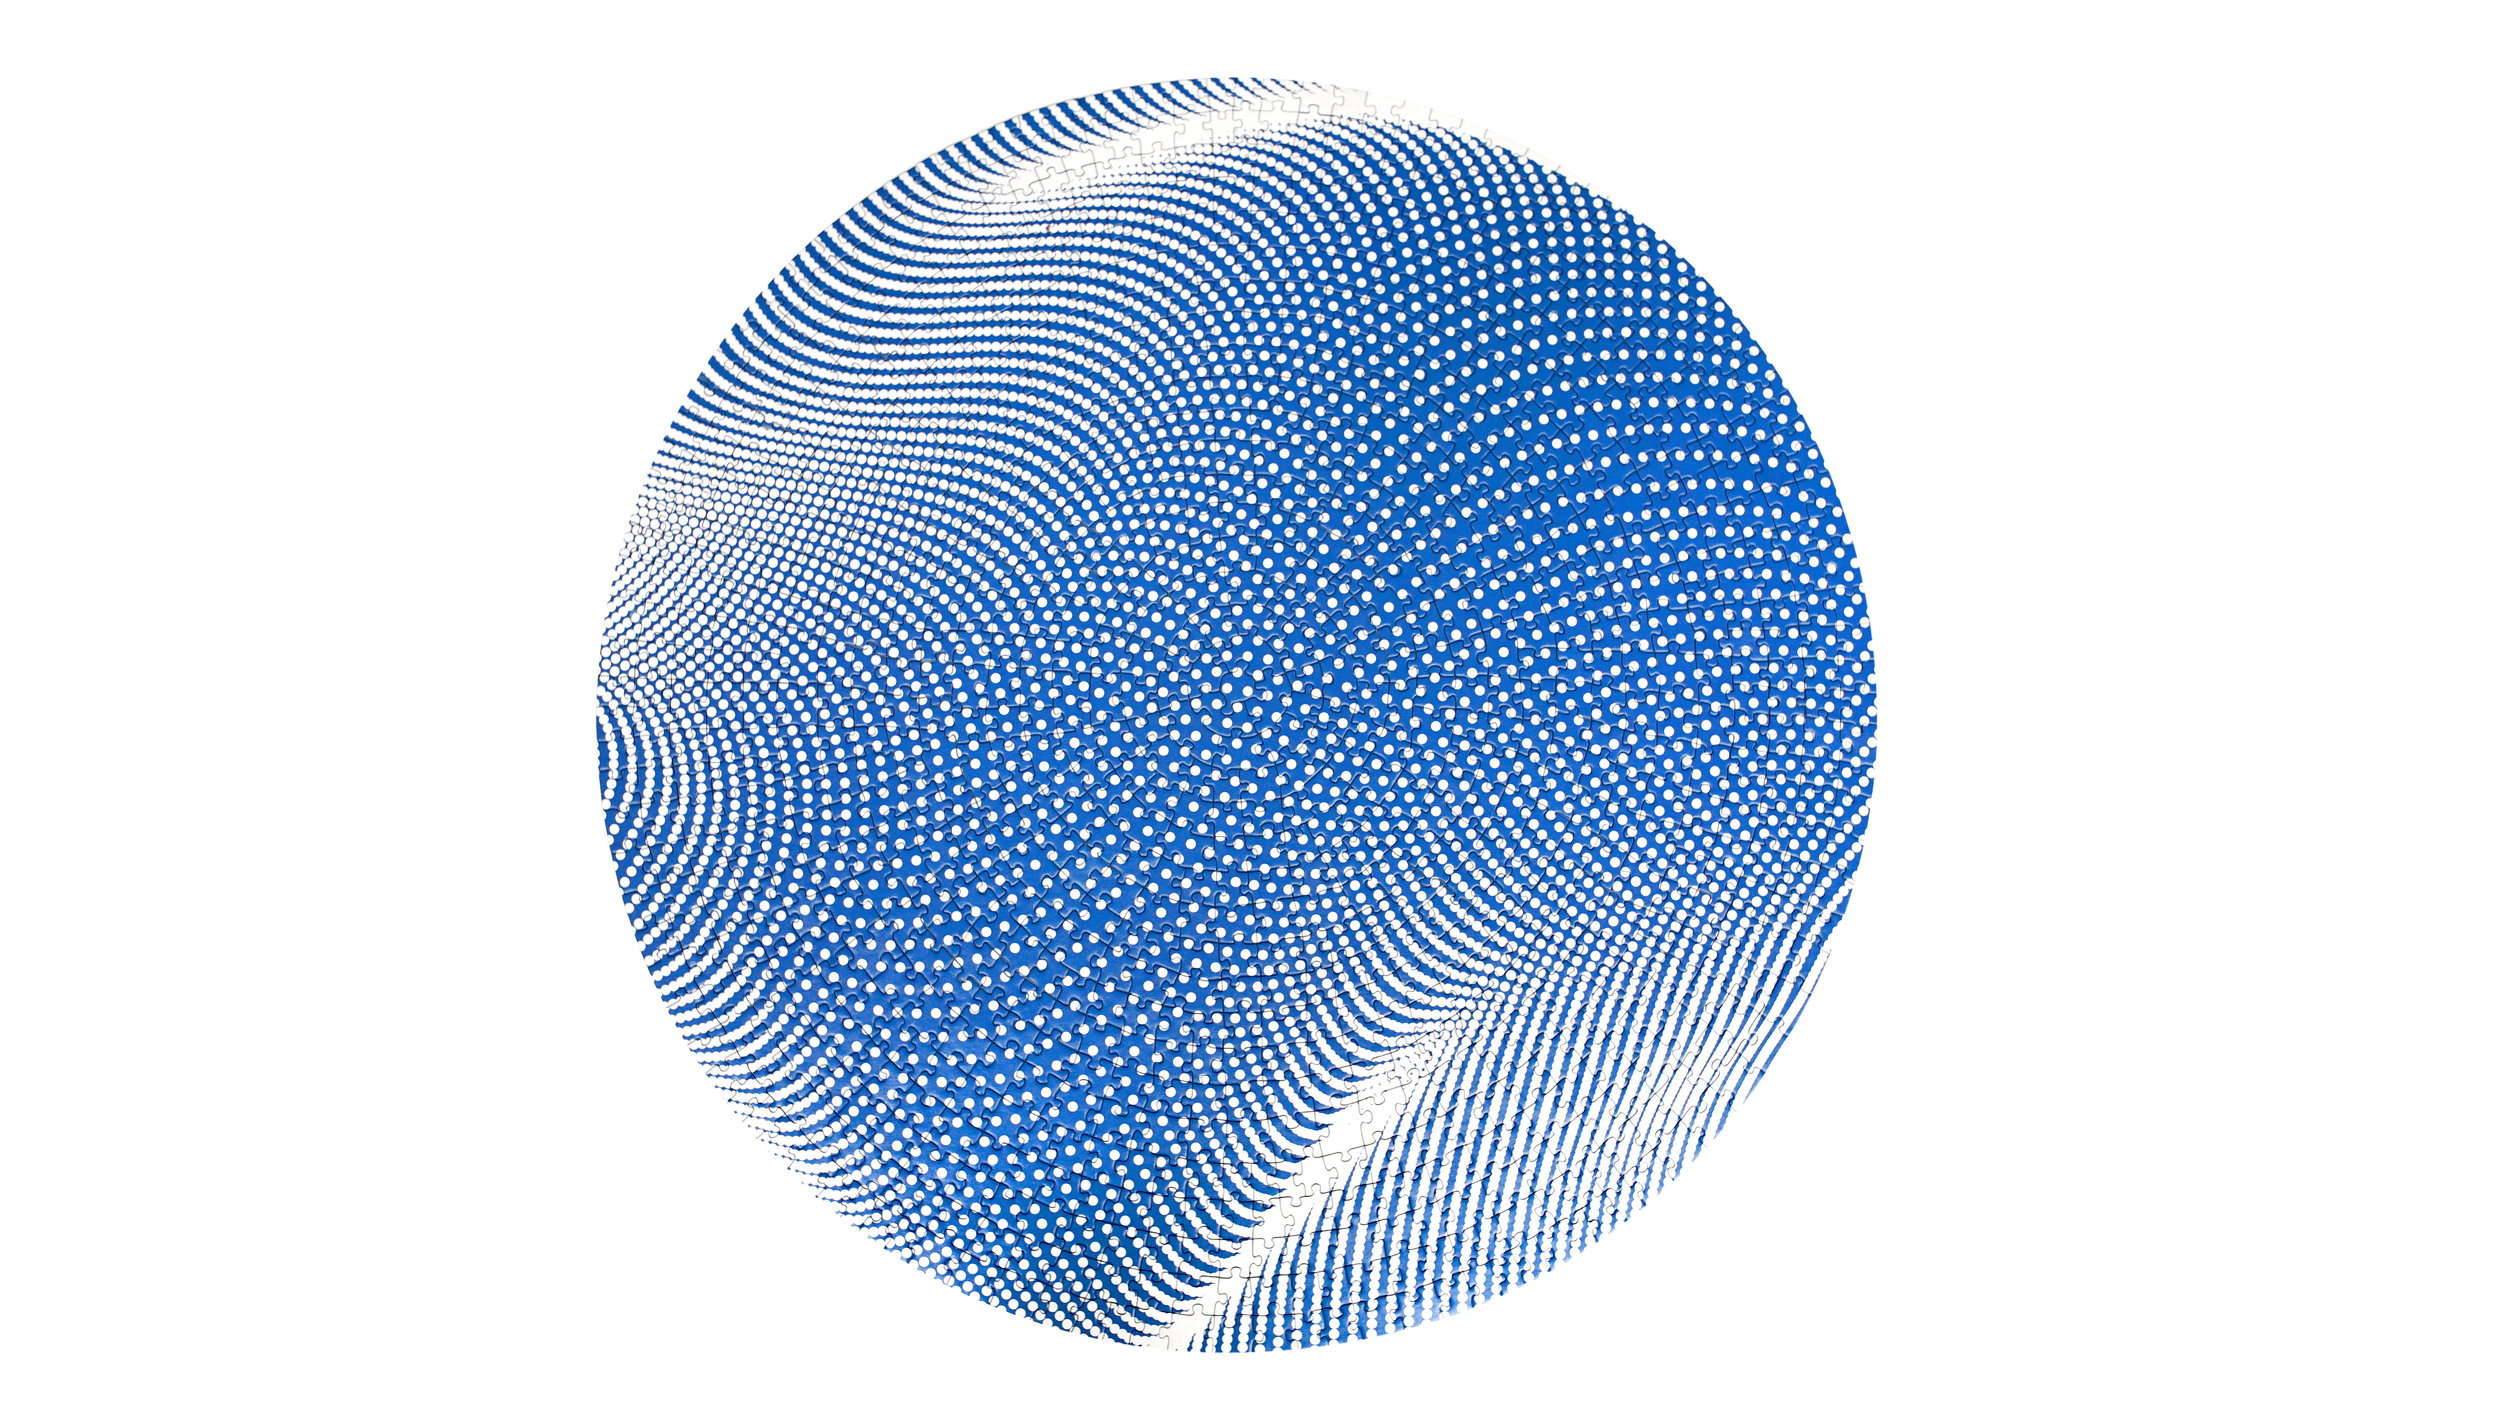 karansingh_lamingtondrive_1000_puzzle_img_02.jpg